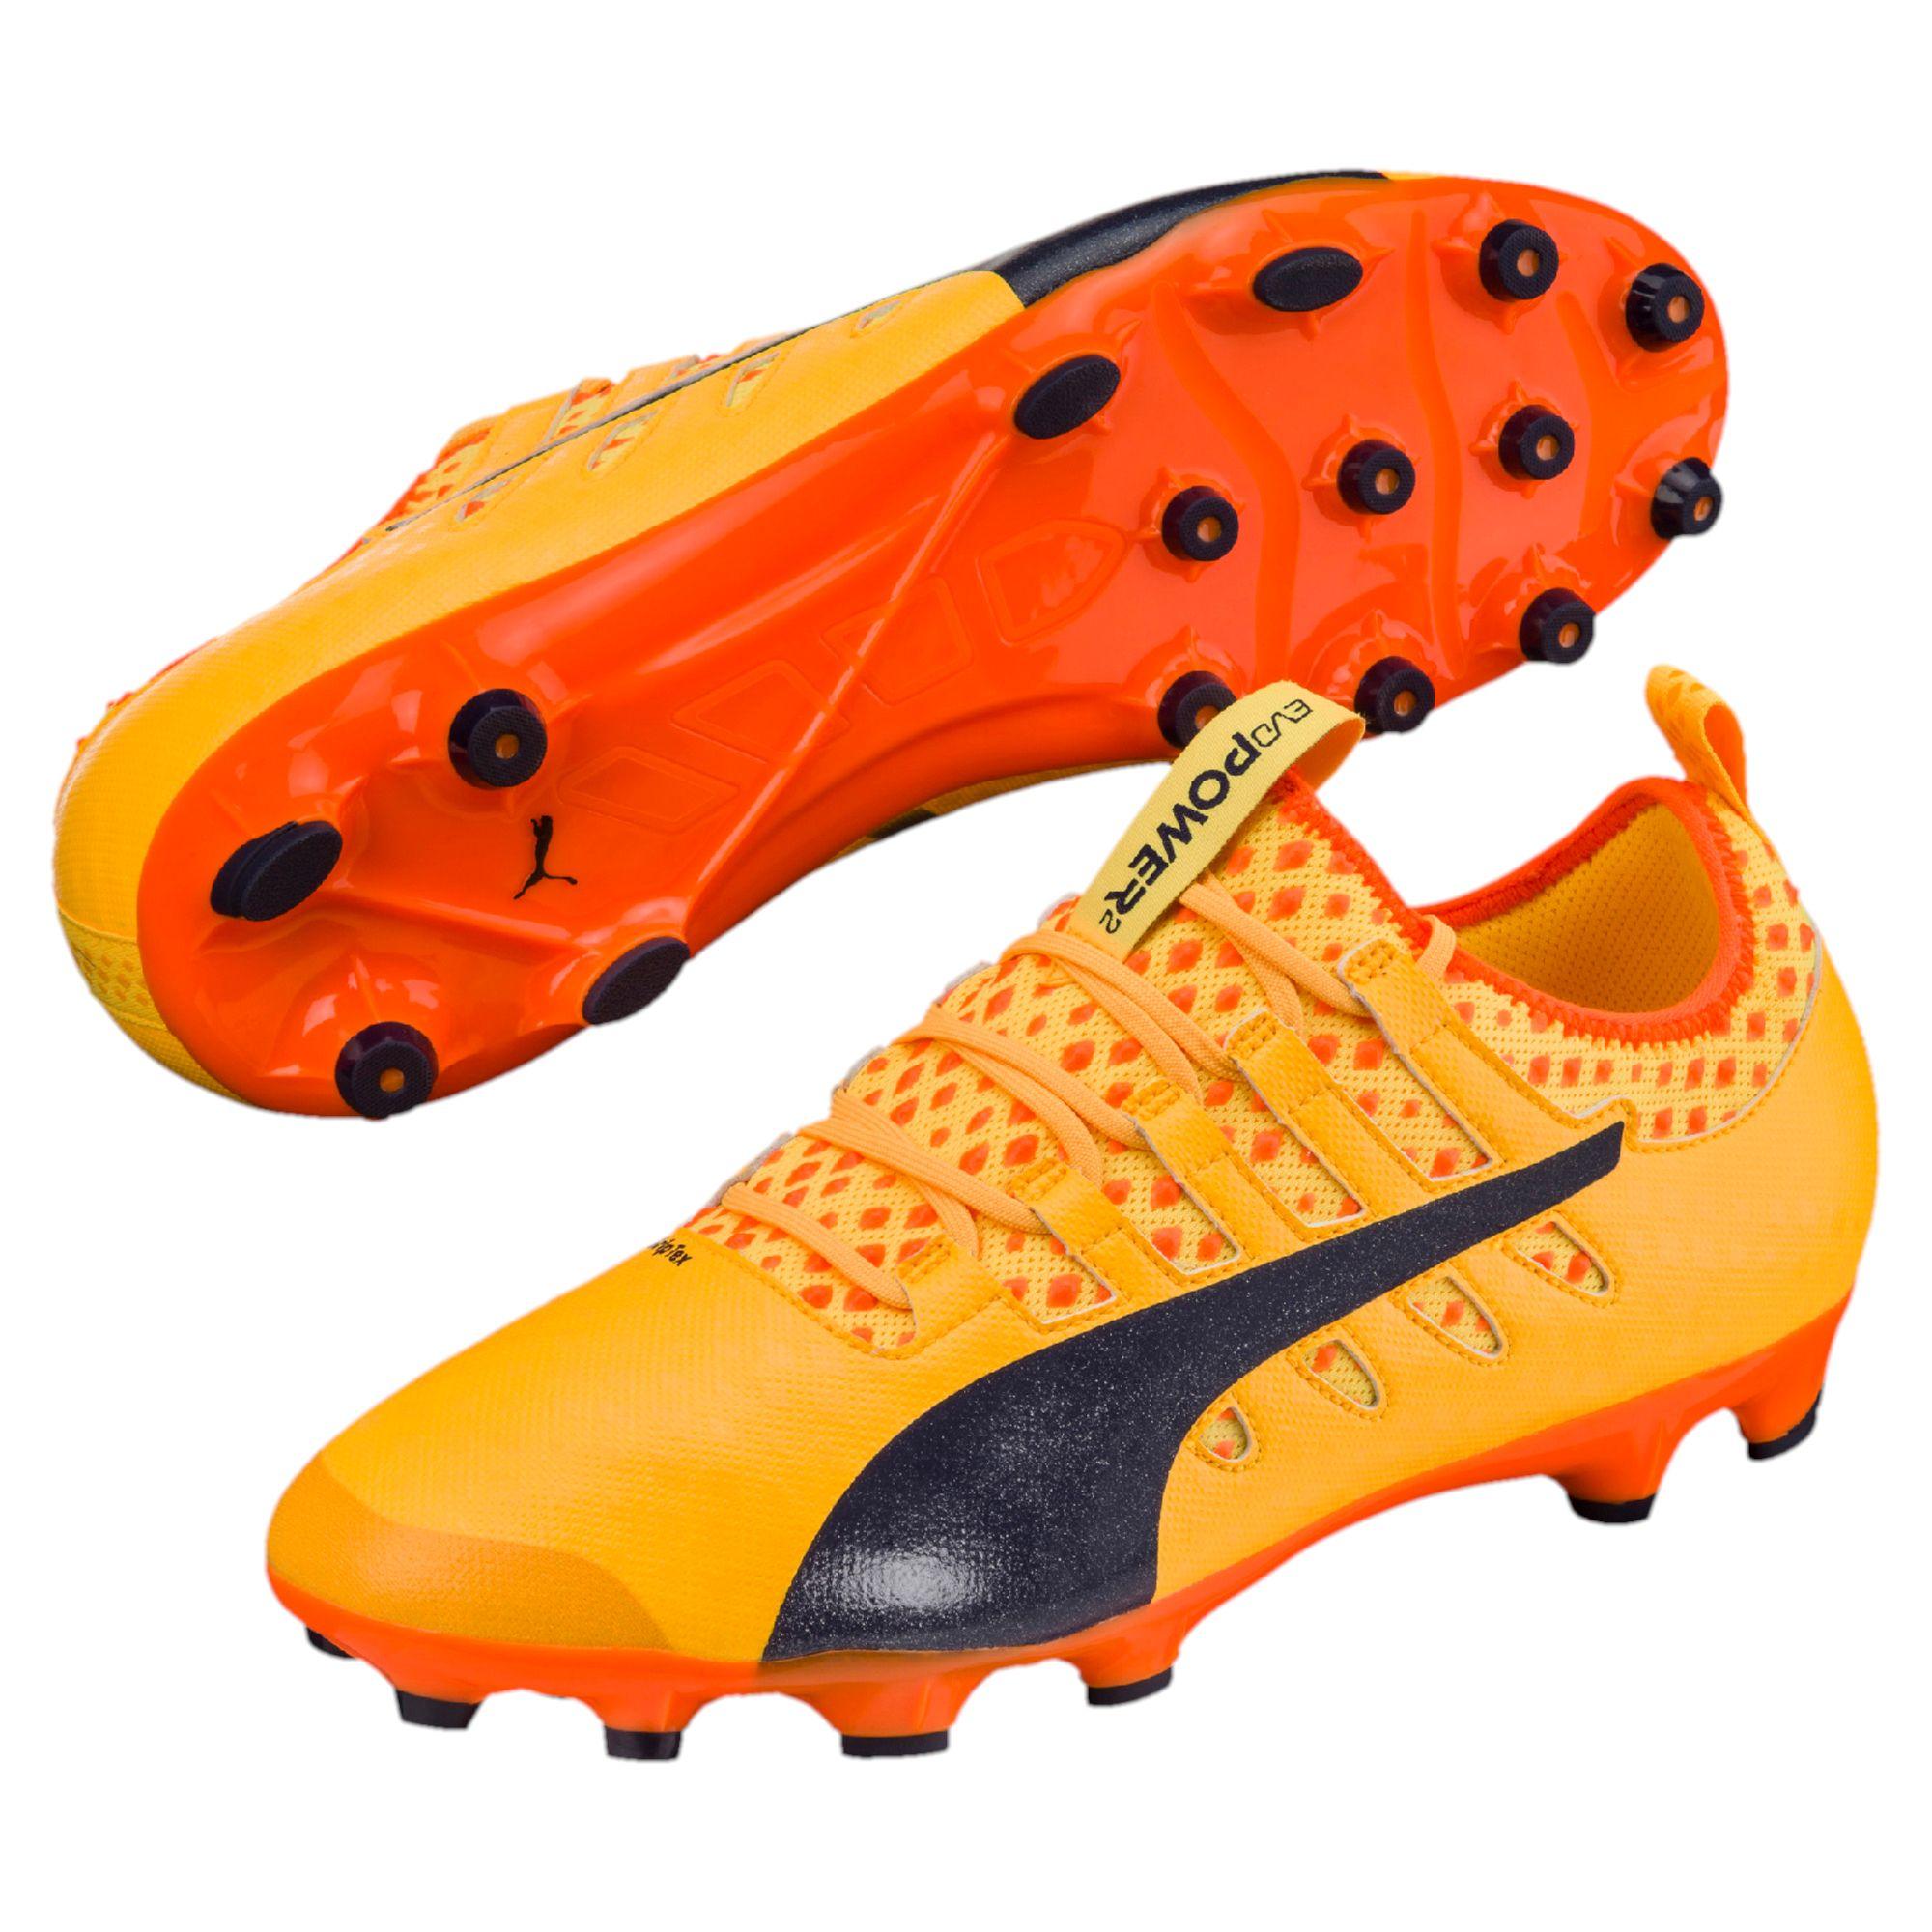 PUMA-evoPOWER-Vigor-2-AG-Men-s-Football-Boots-Hombre-Zapatos-Futbol-Nuevo miniatura 8